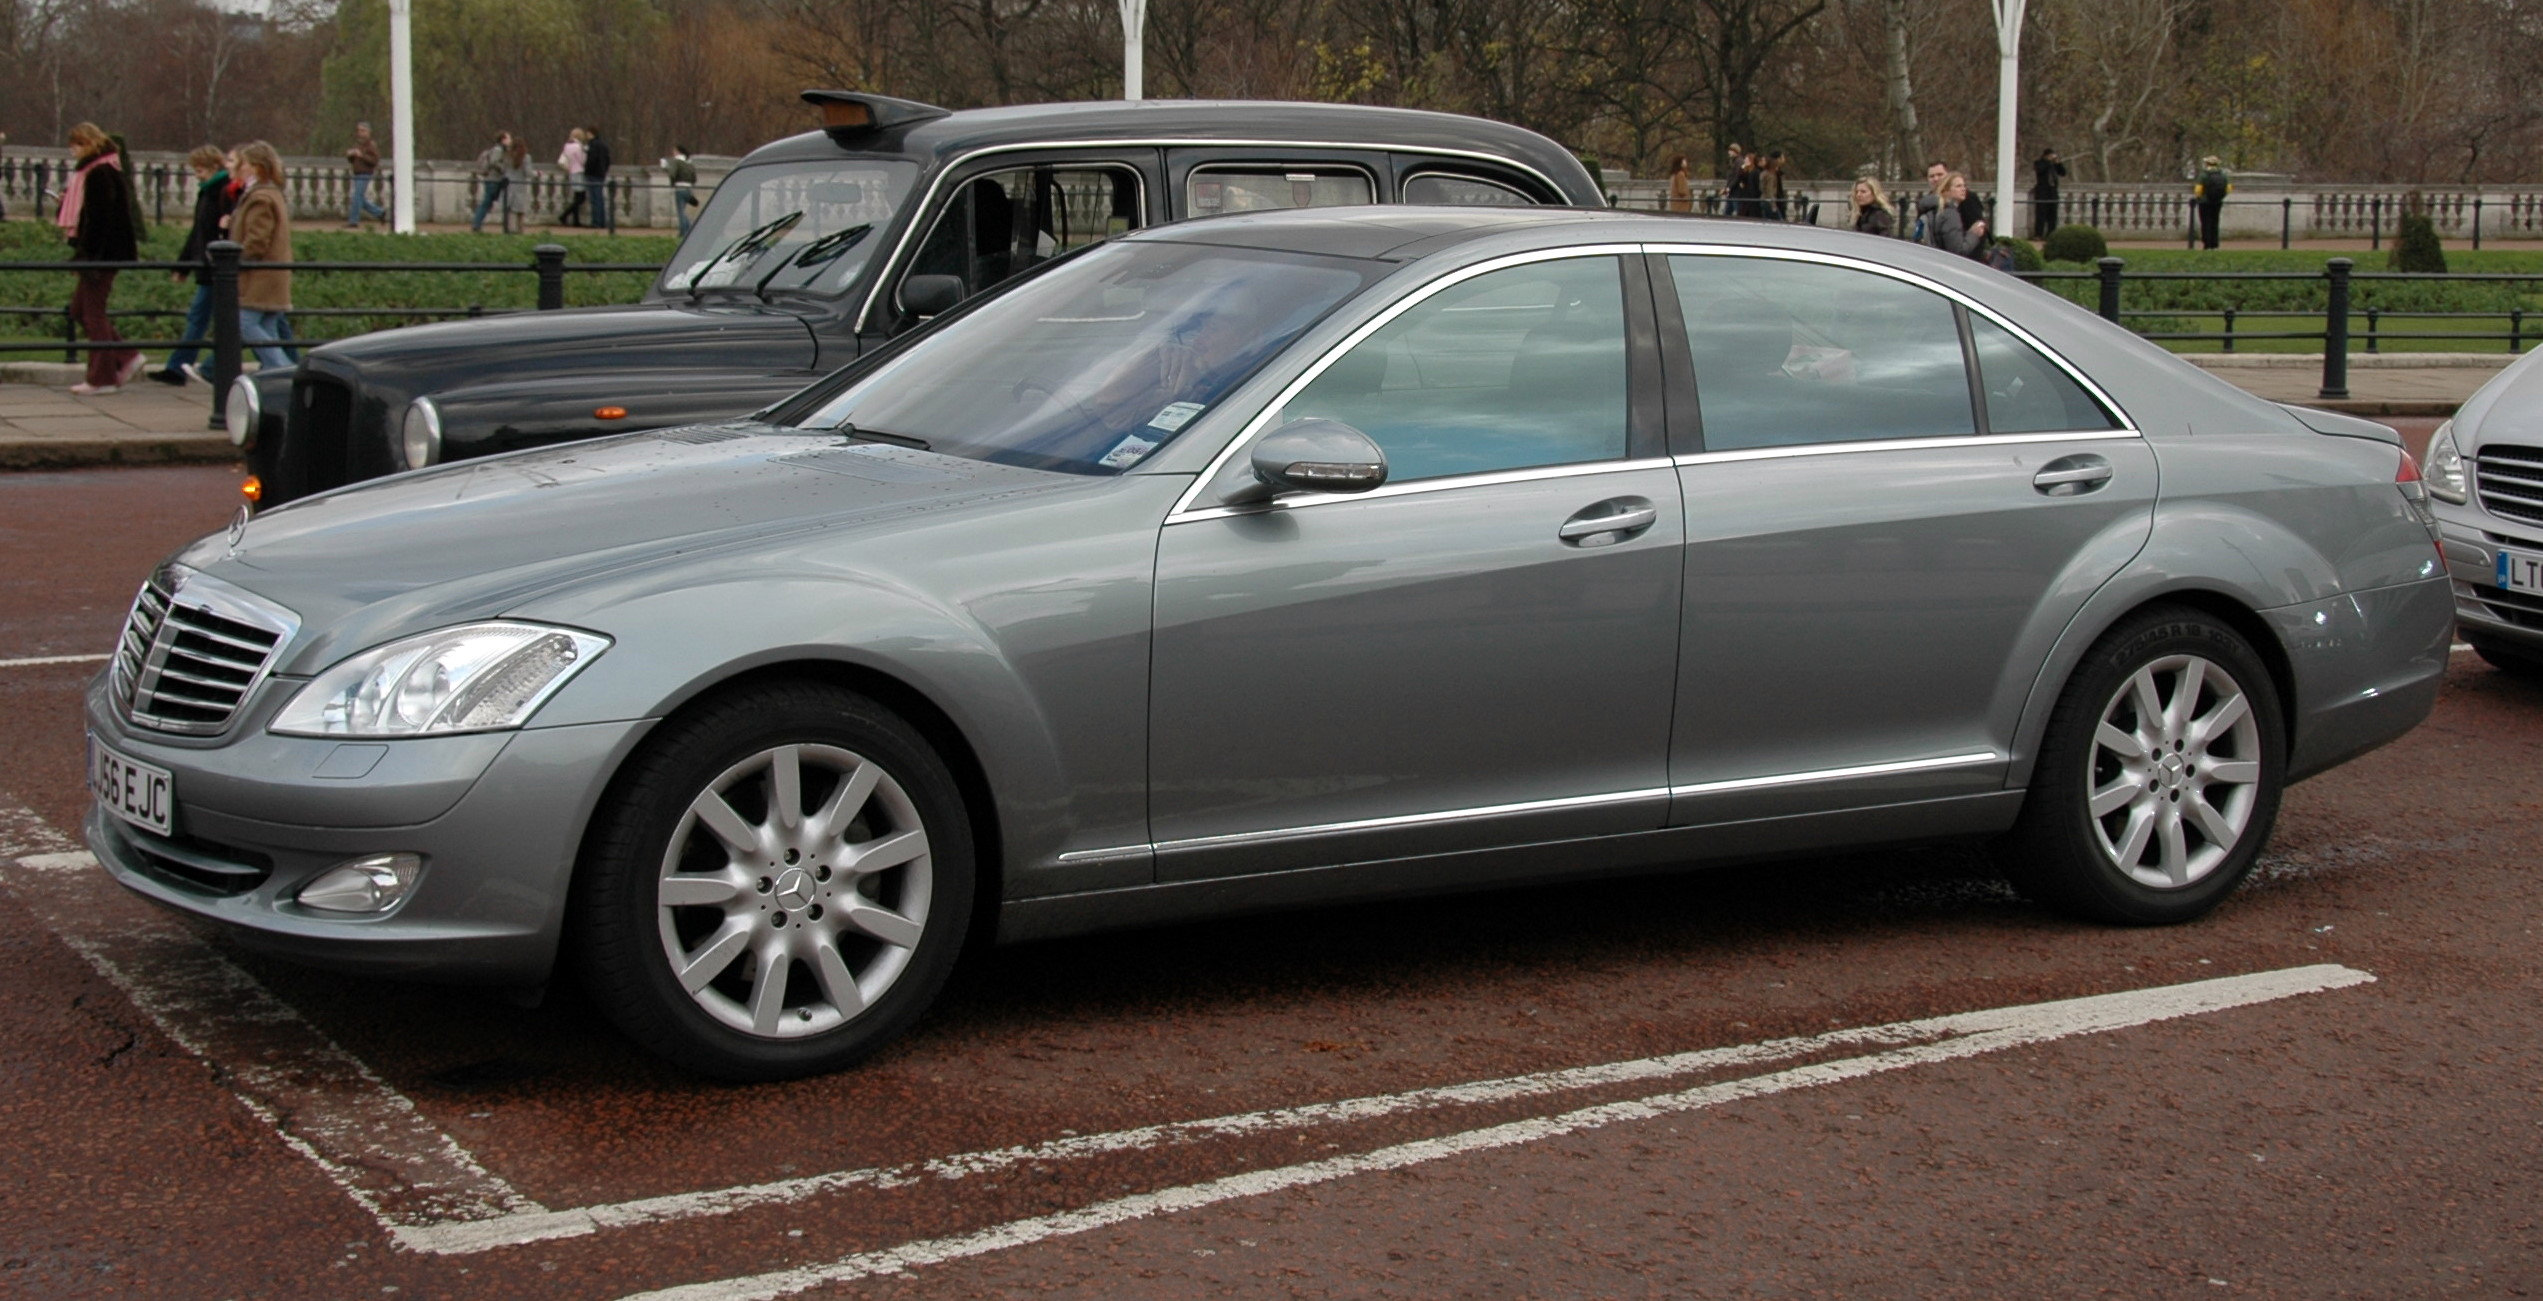 Mercedes benz s 600 l photos reviews news specs buy car for Buy my mercedes benz